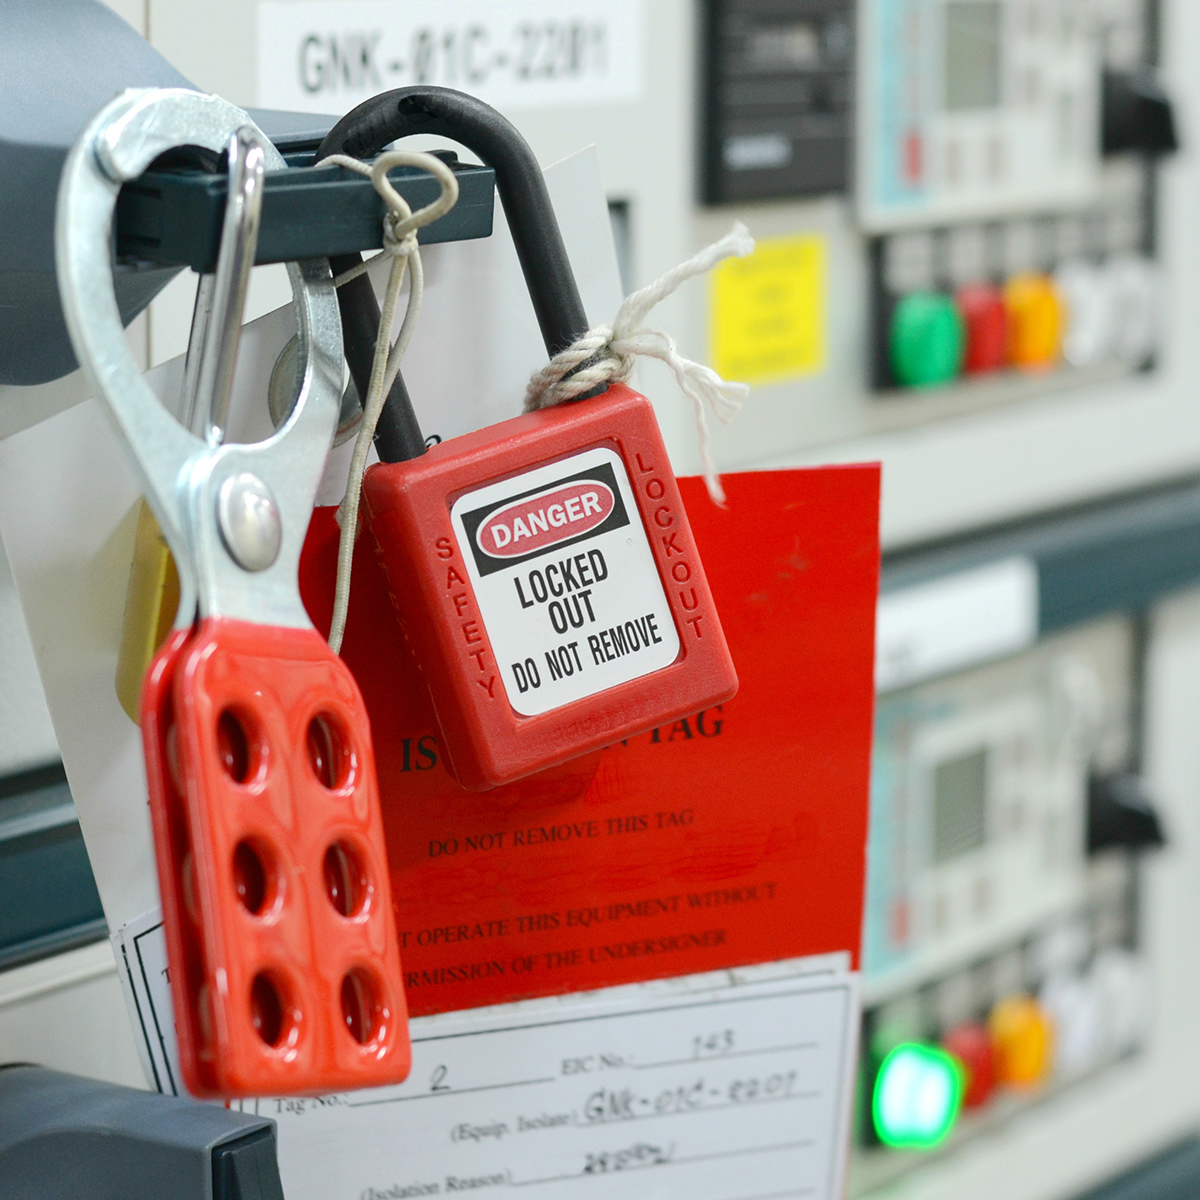 Solutions, Functional Safety, PRISMA Impianti, automazione, impiantistica, ingegneria